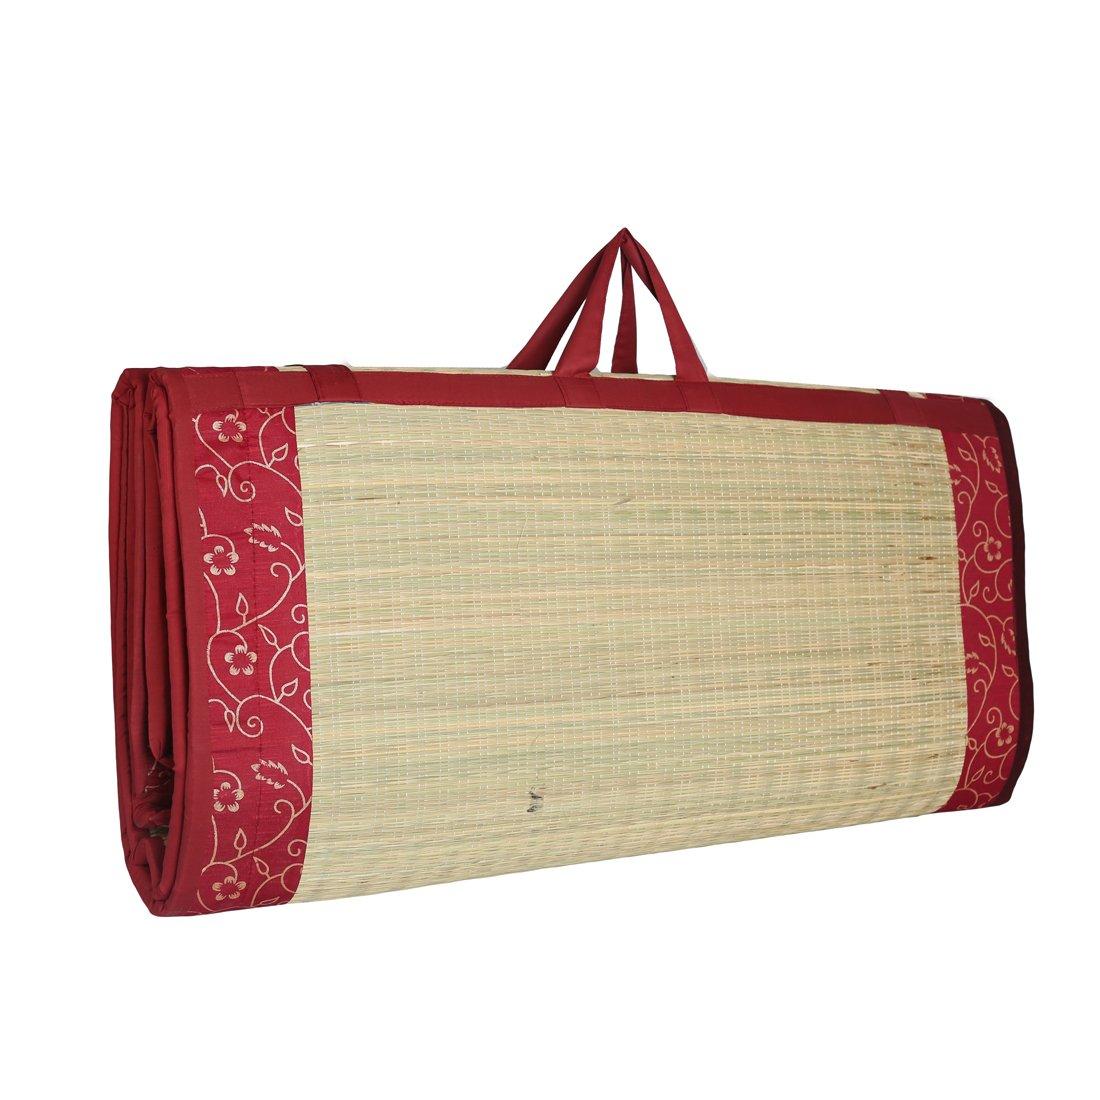 Kala Darshan Crafts Bazaar Cotton Happy Sleeping River Grass 3 Fold Cushion Mat Easy Hand Wash, 6X6ft, Red